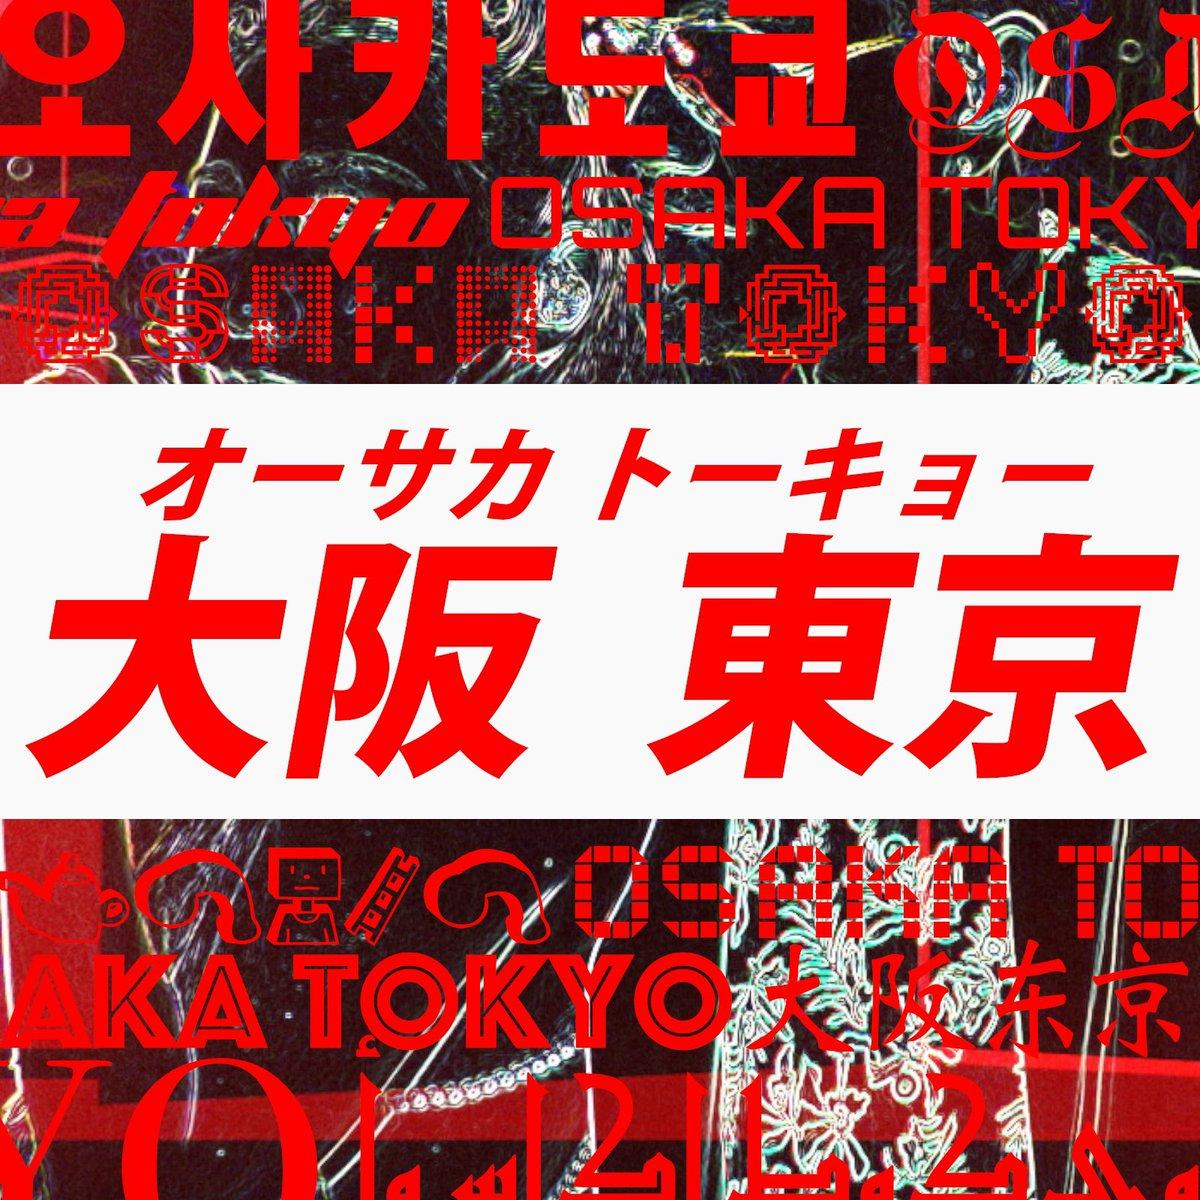 EXILE ATSUSHI x 倖田來未 - オーサカトーキョー Lyrics